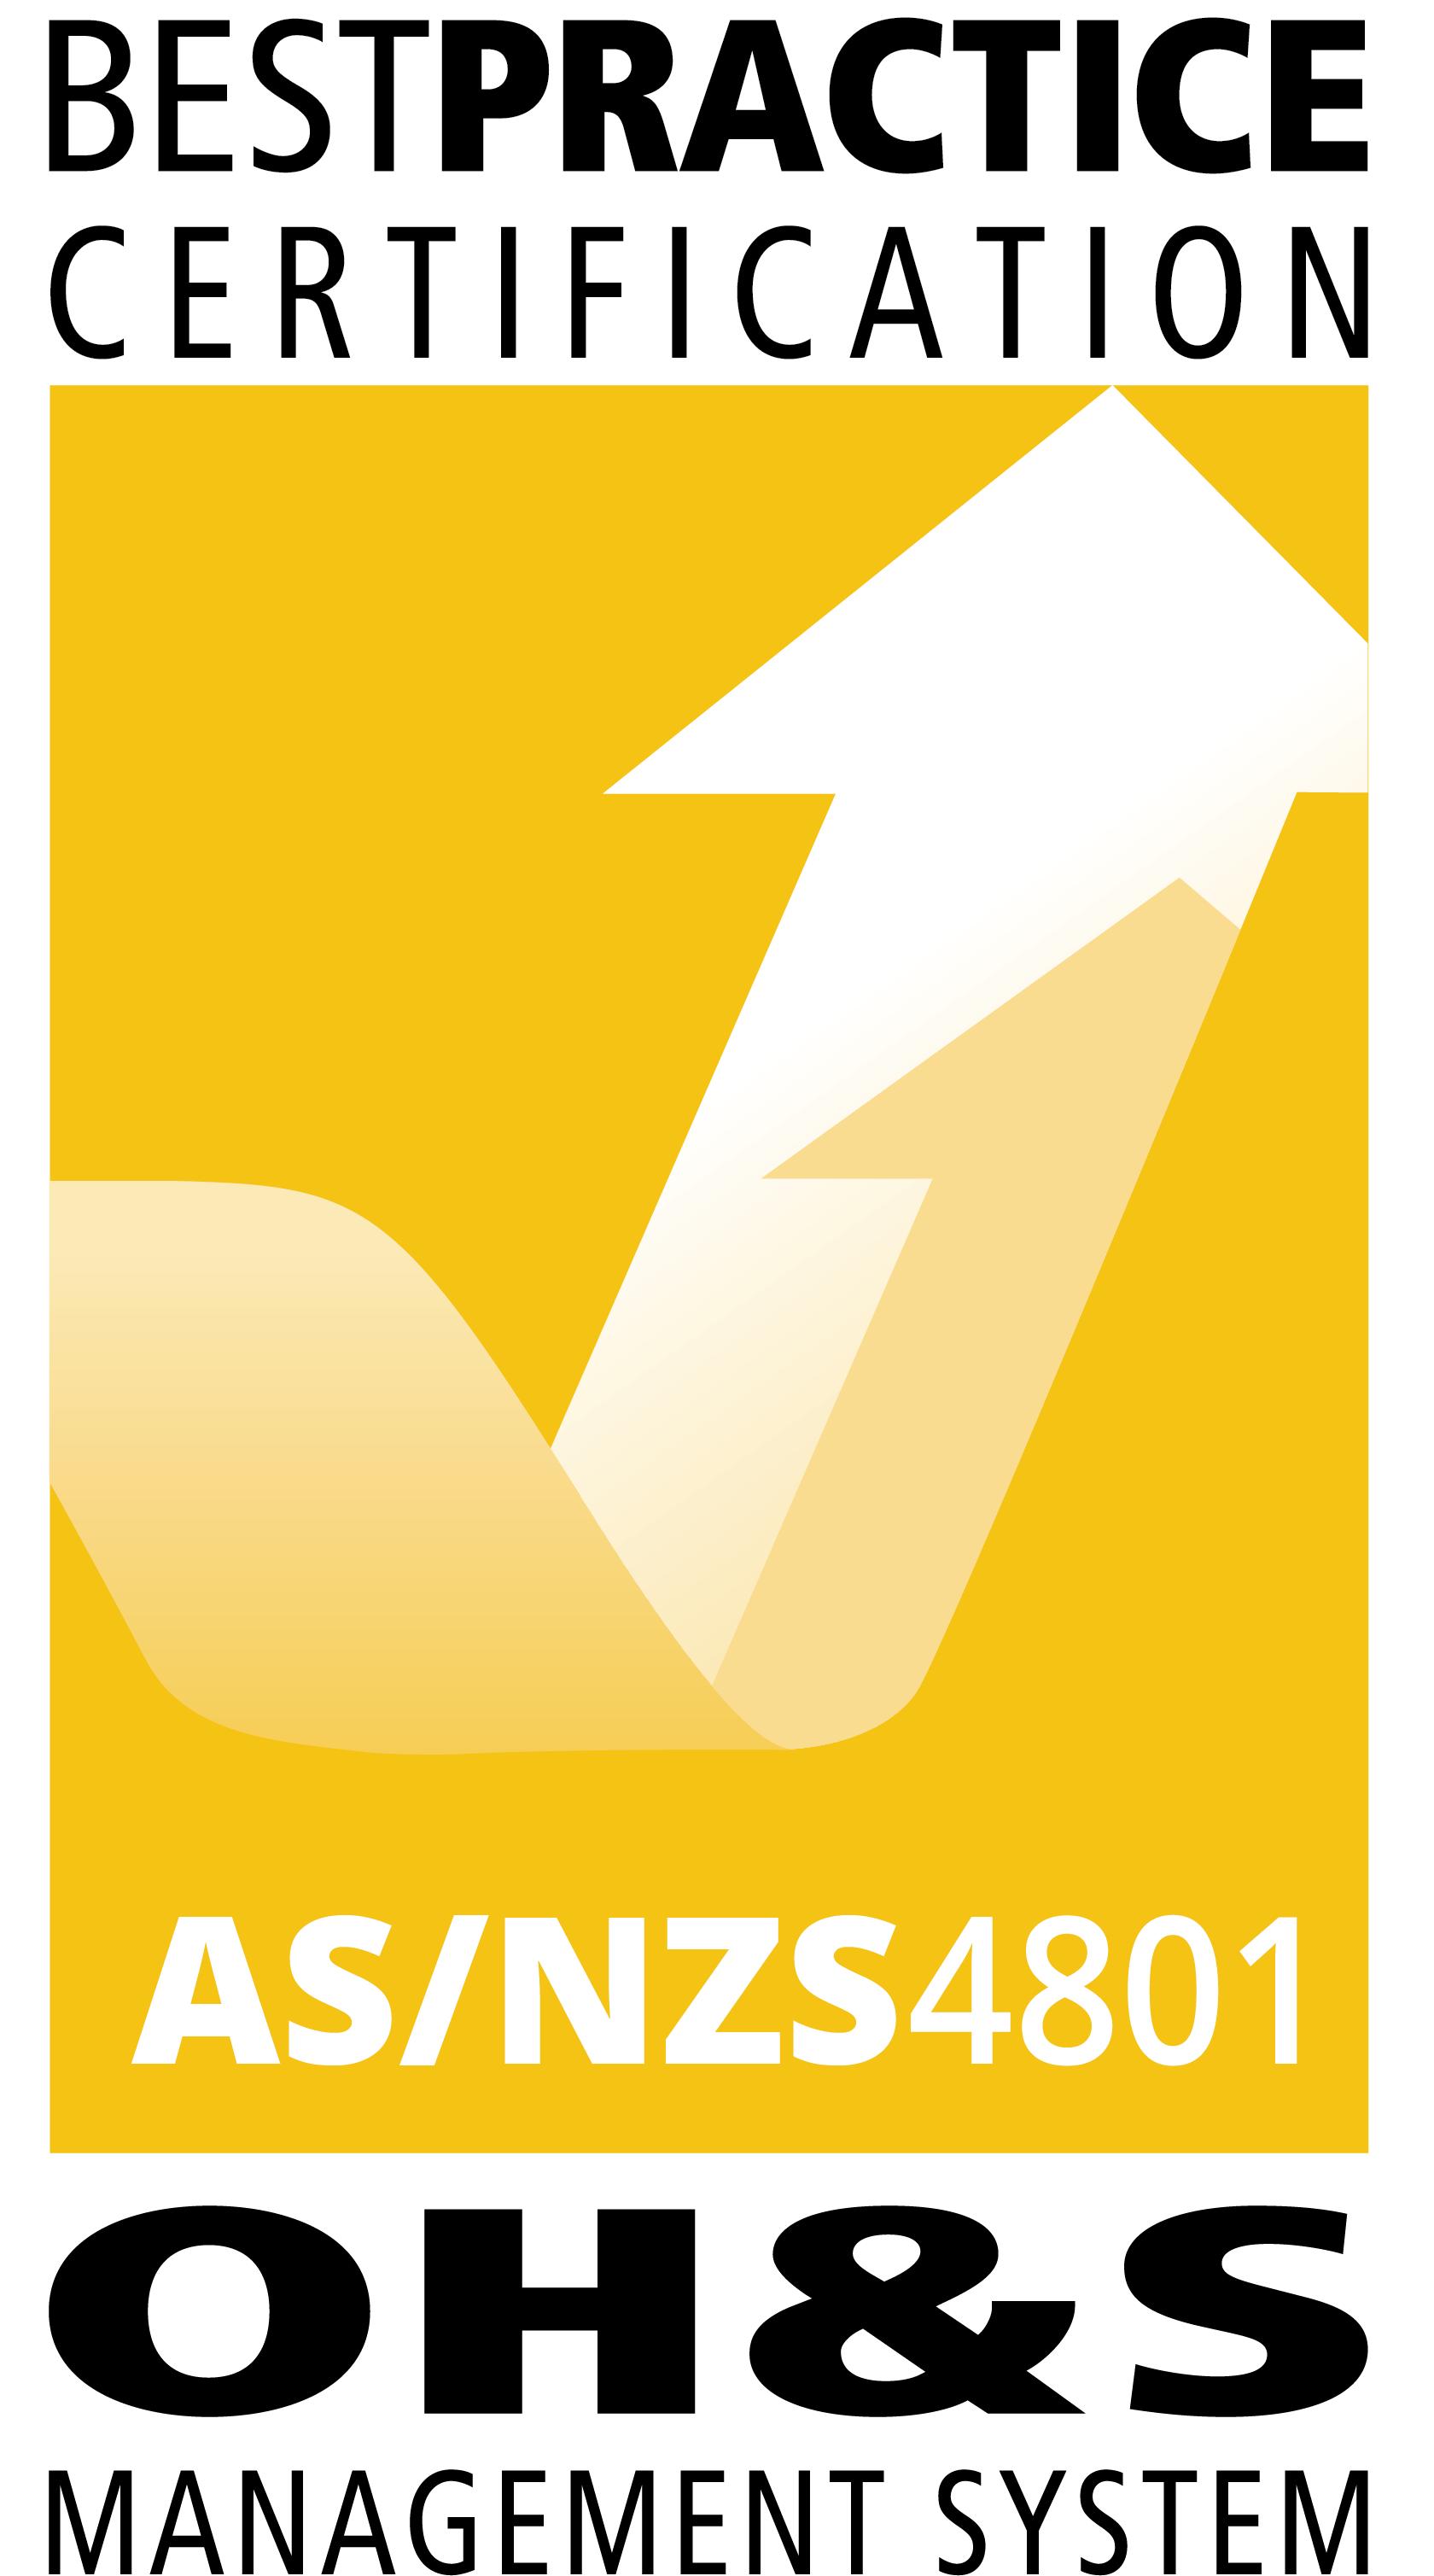 AS/NZS4801